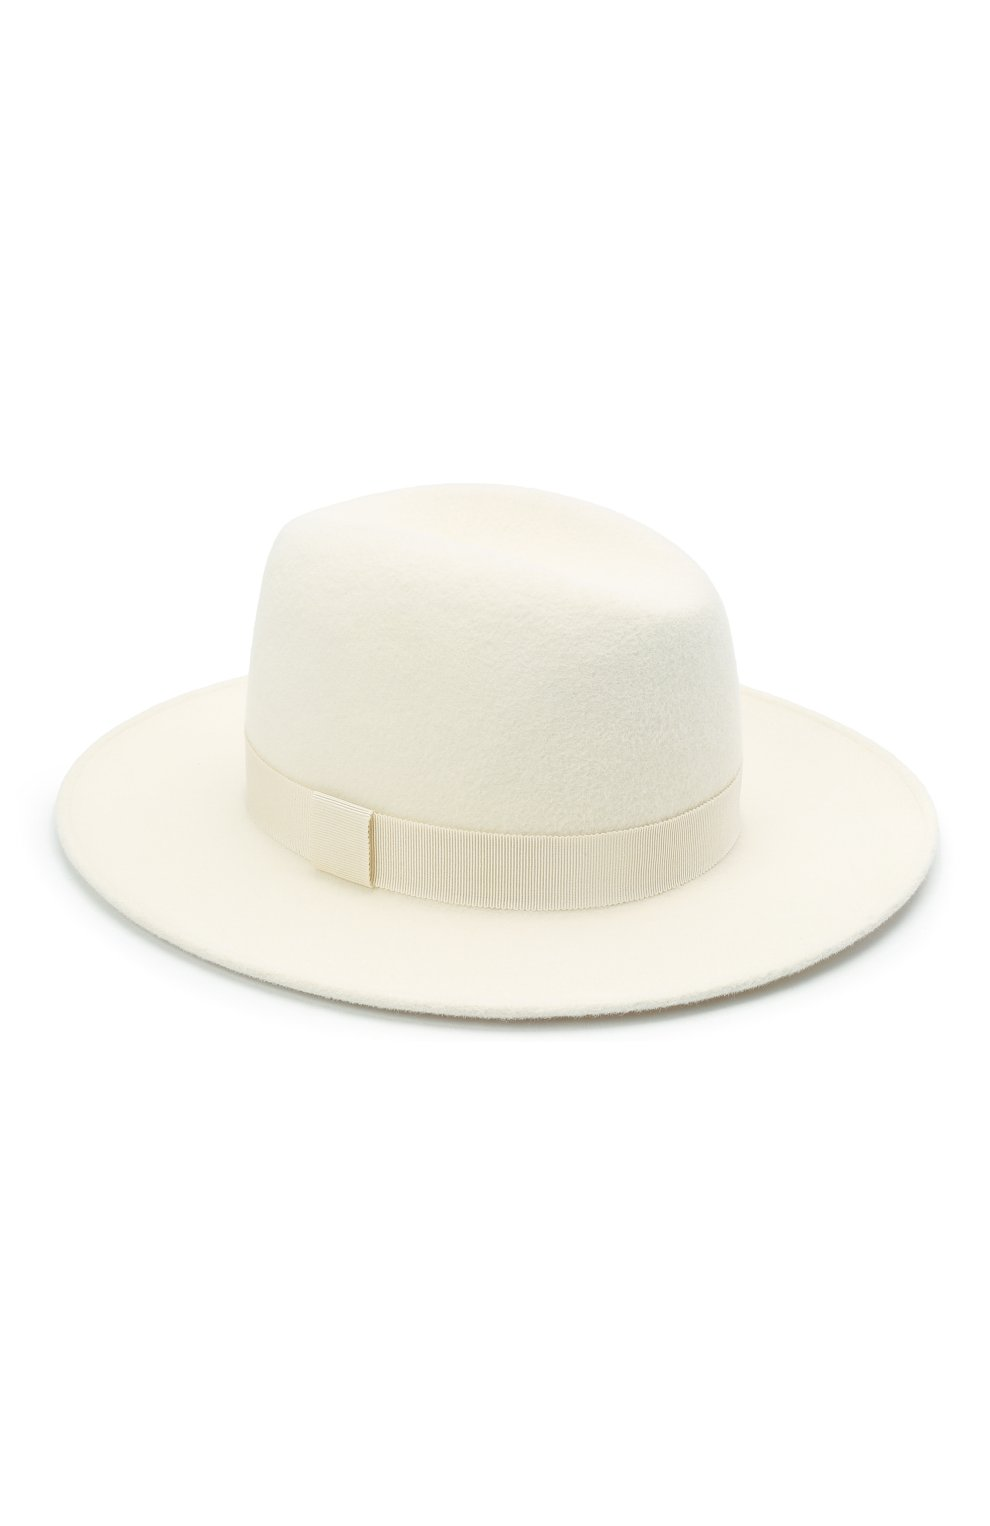 Женская шляпа london COCOSHNICK HEADDRESS белого цвета, арт. londonl-01 | Фото 1 (Материал: Текстиль)